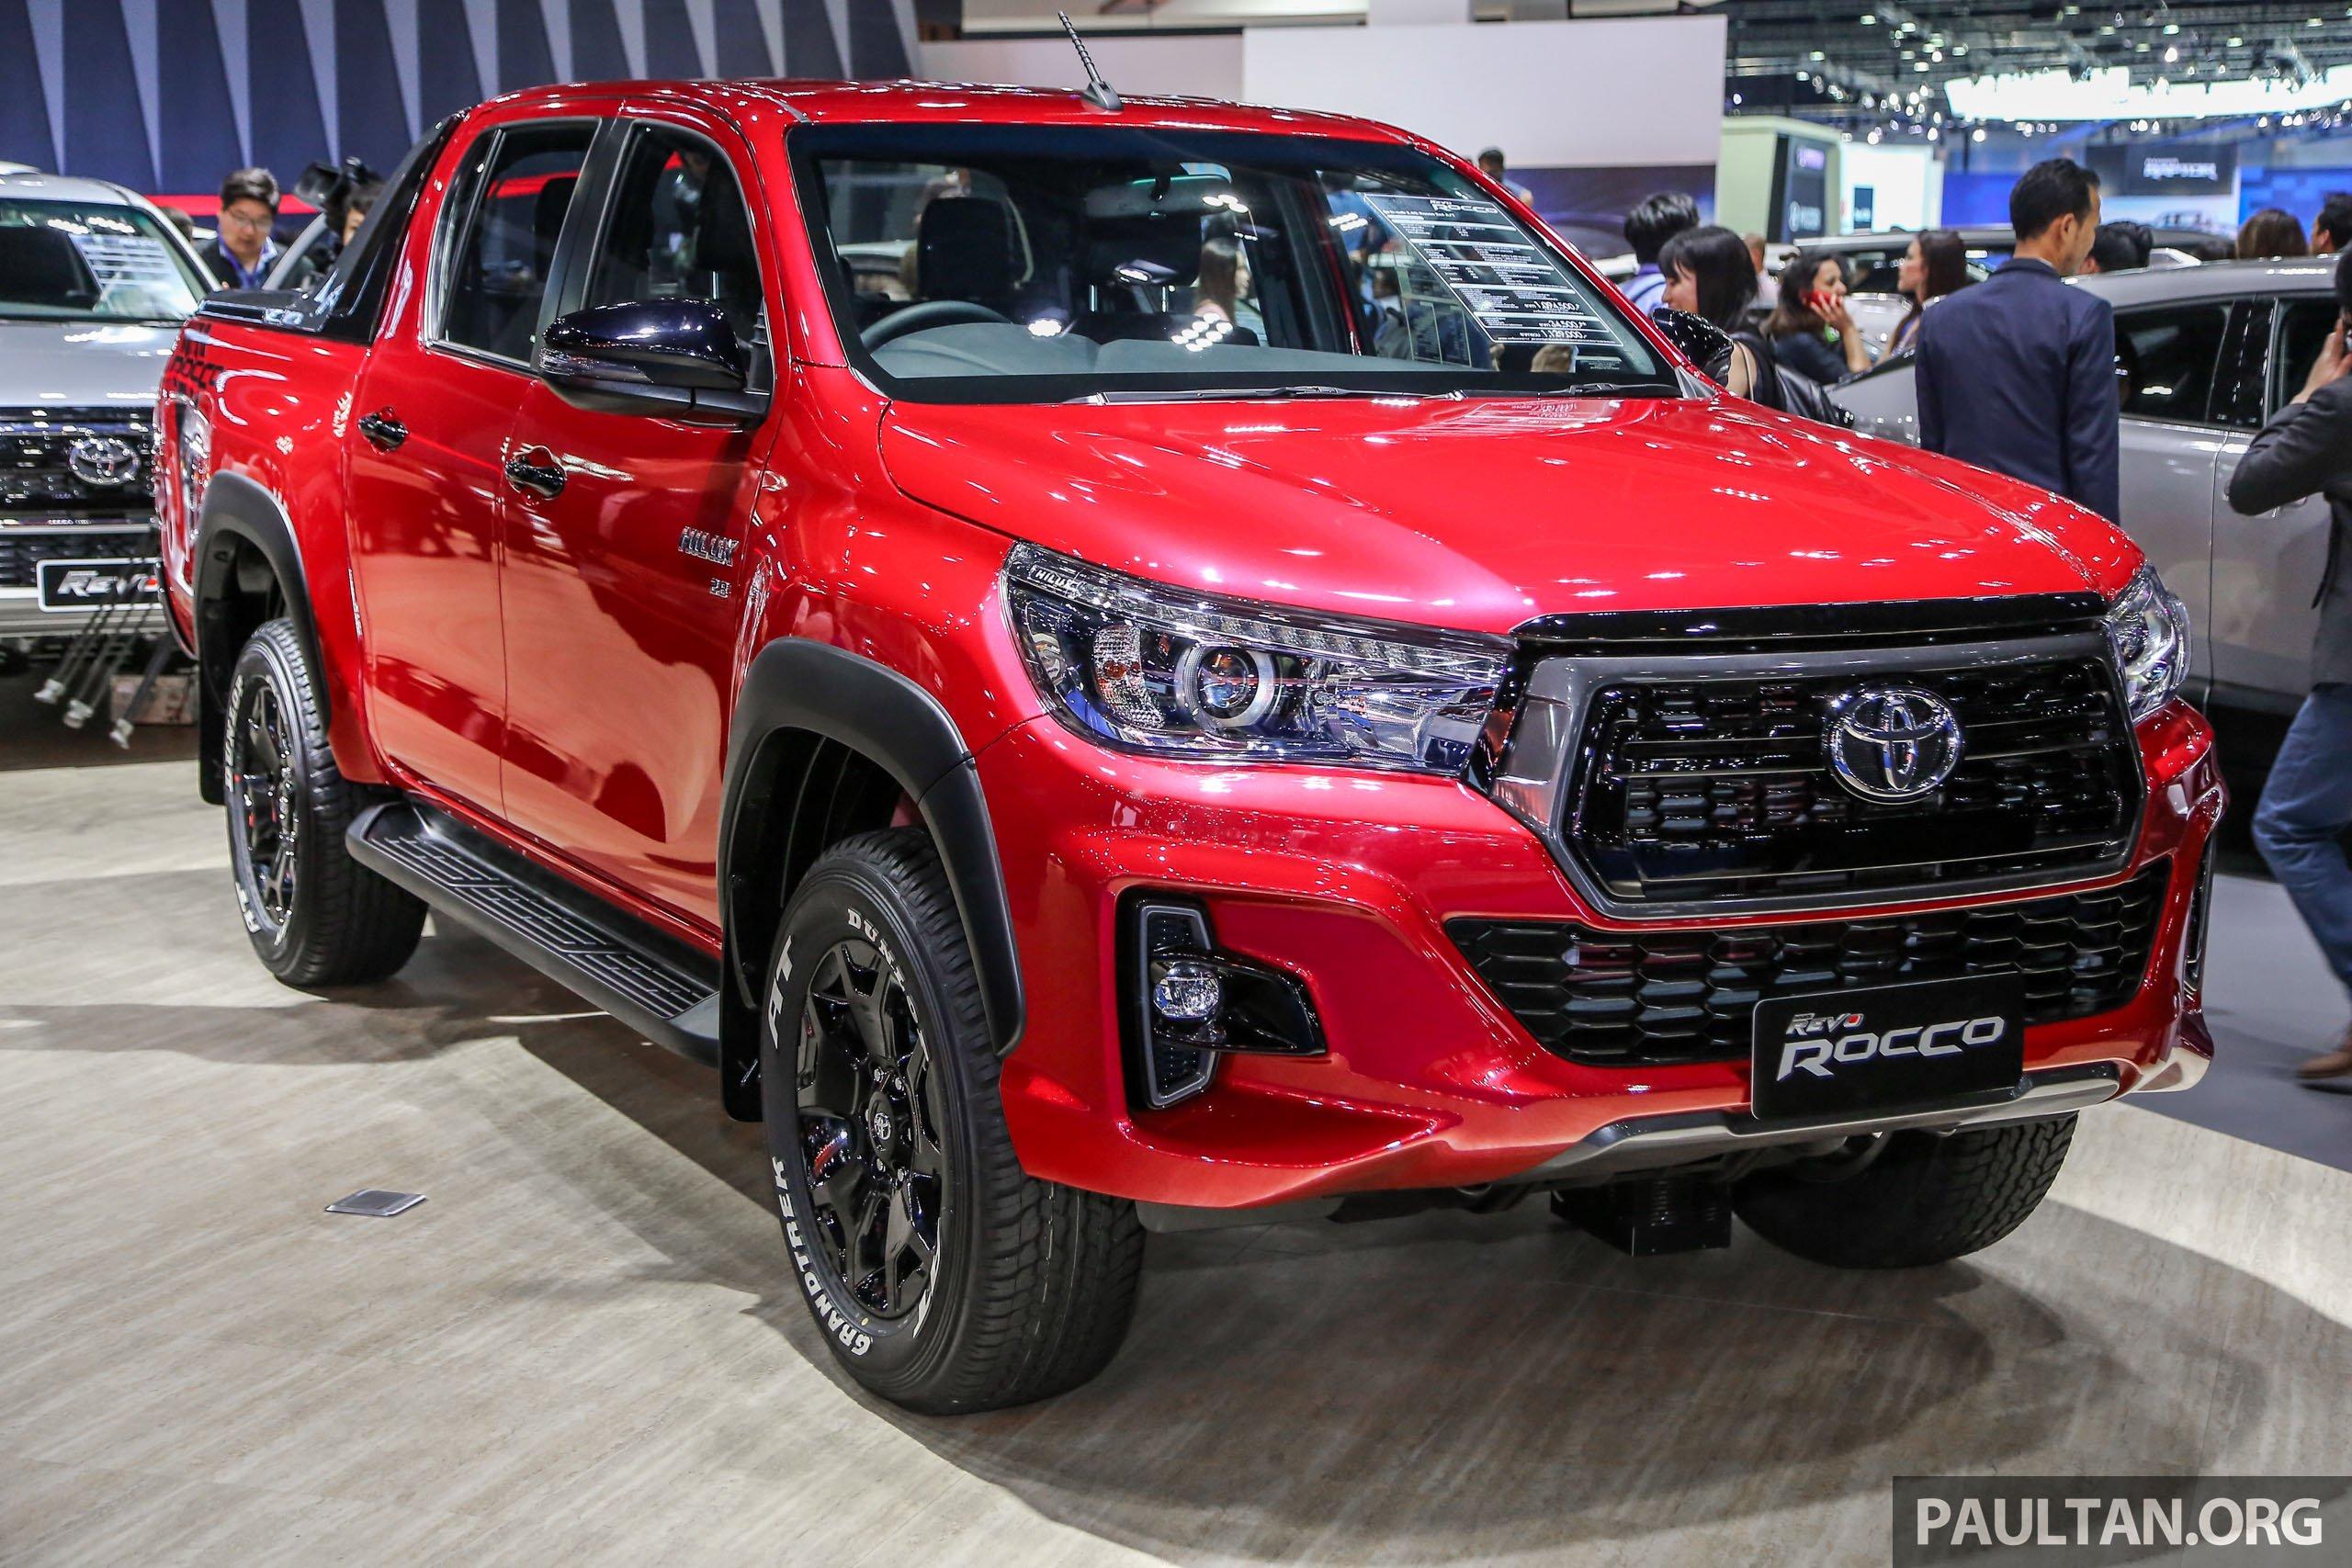 Kelebihan Harga Toyota Hilux 2019 Perbandingan Harga